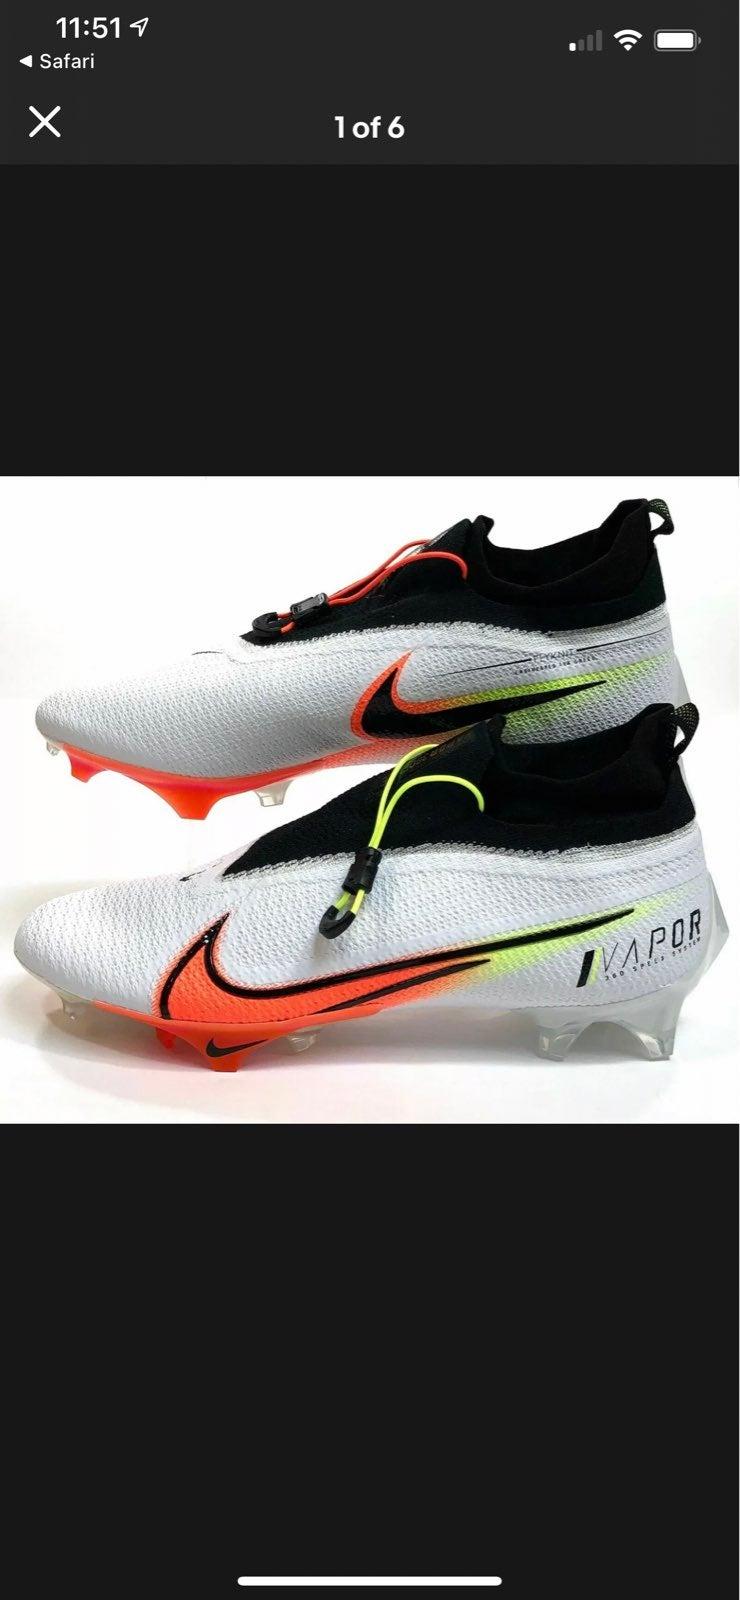 Brand: Nike  2 Nike Vapor Edge Elite 360